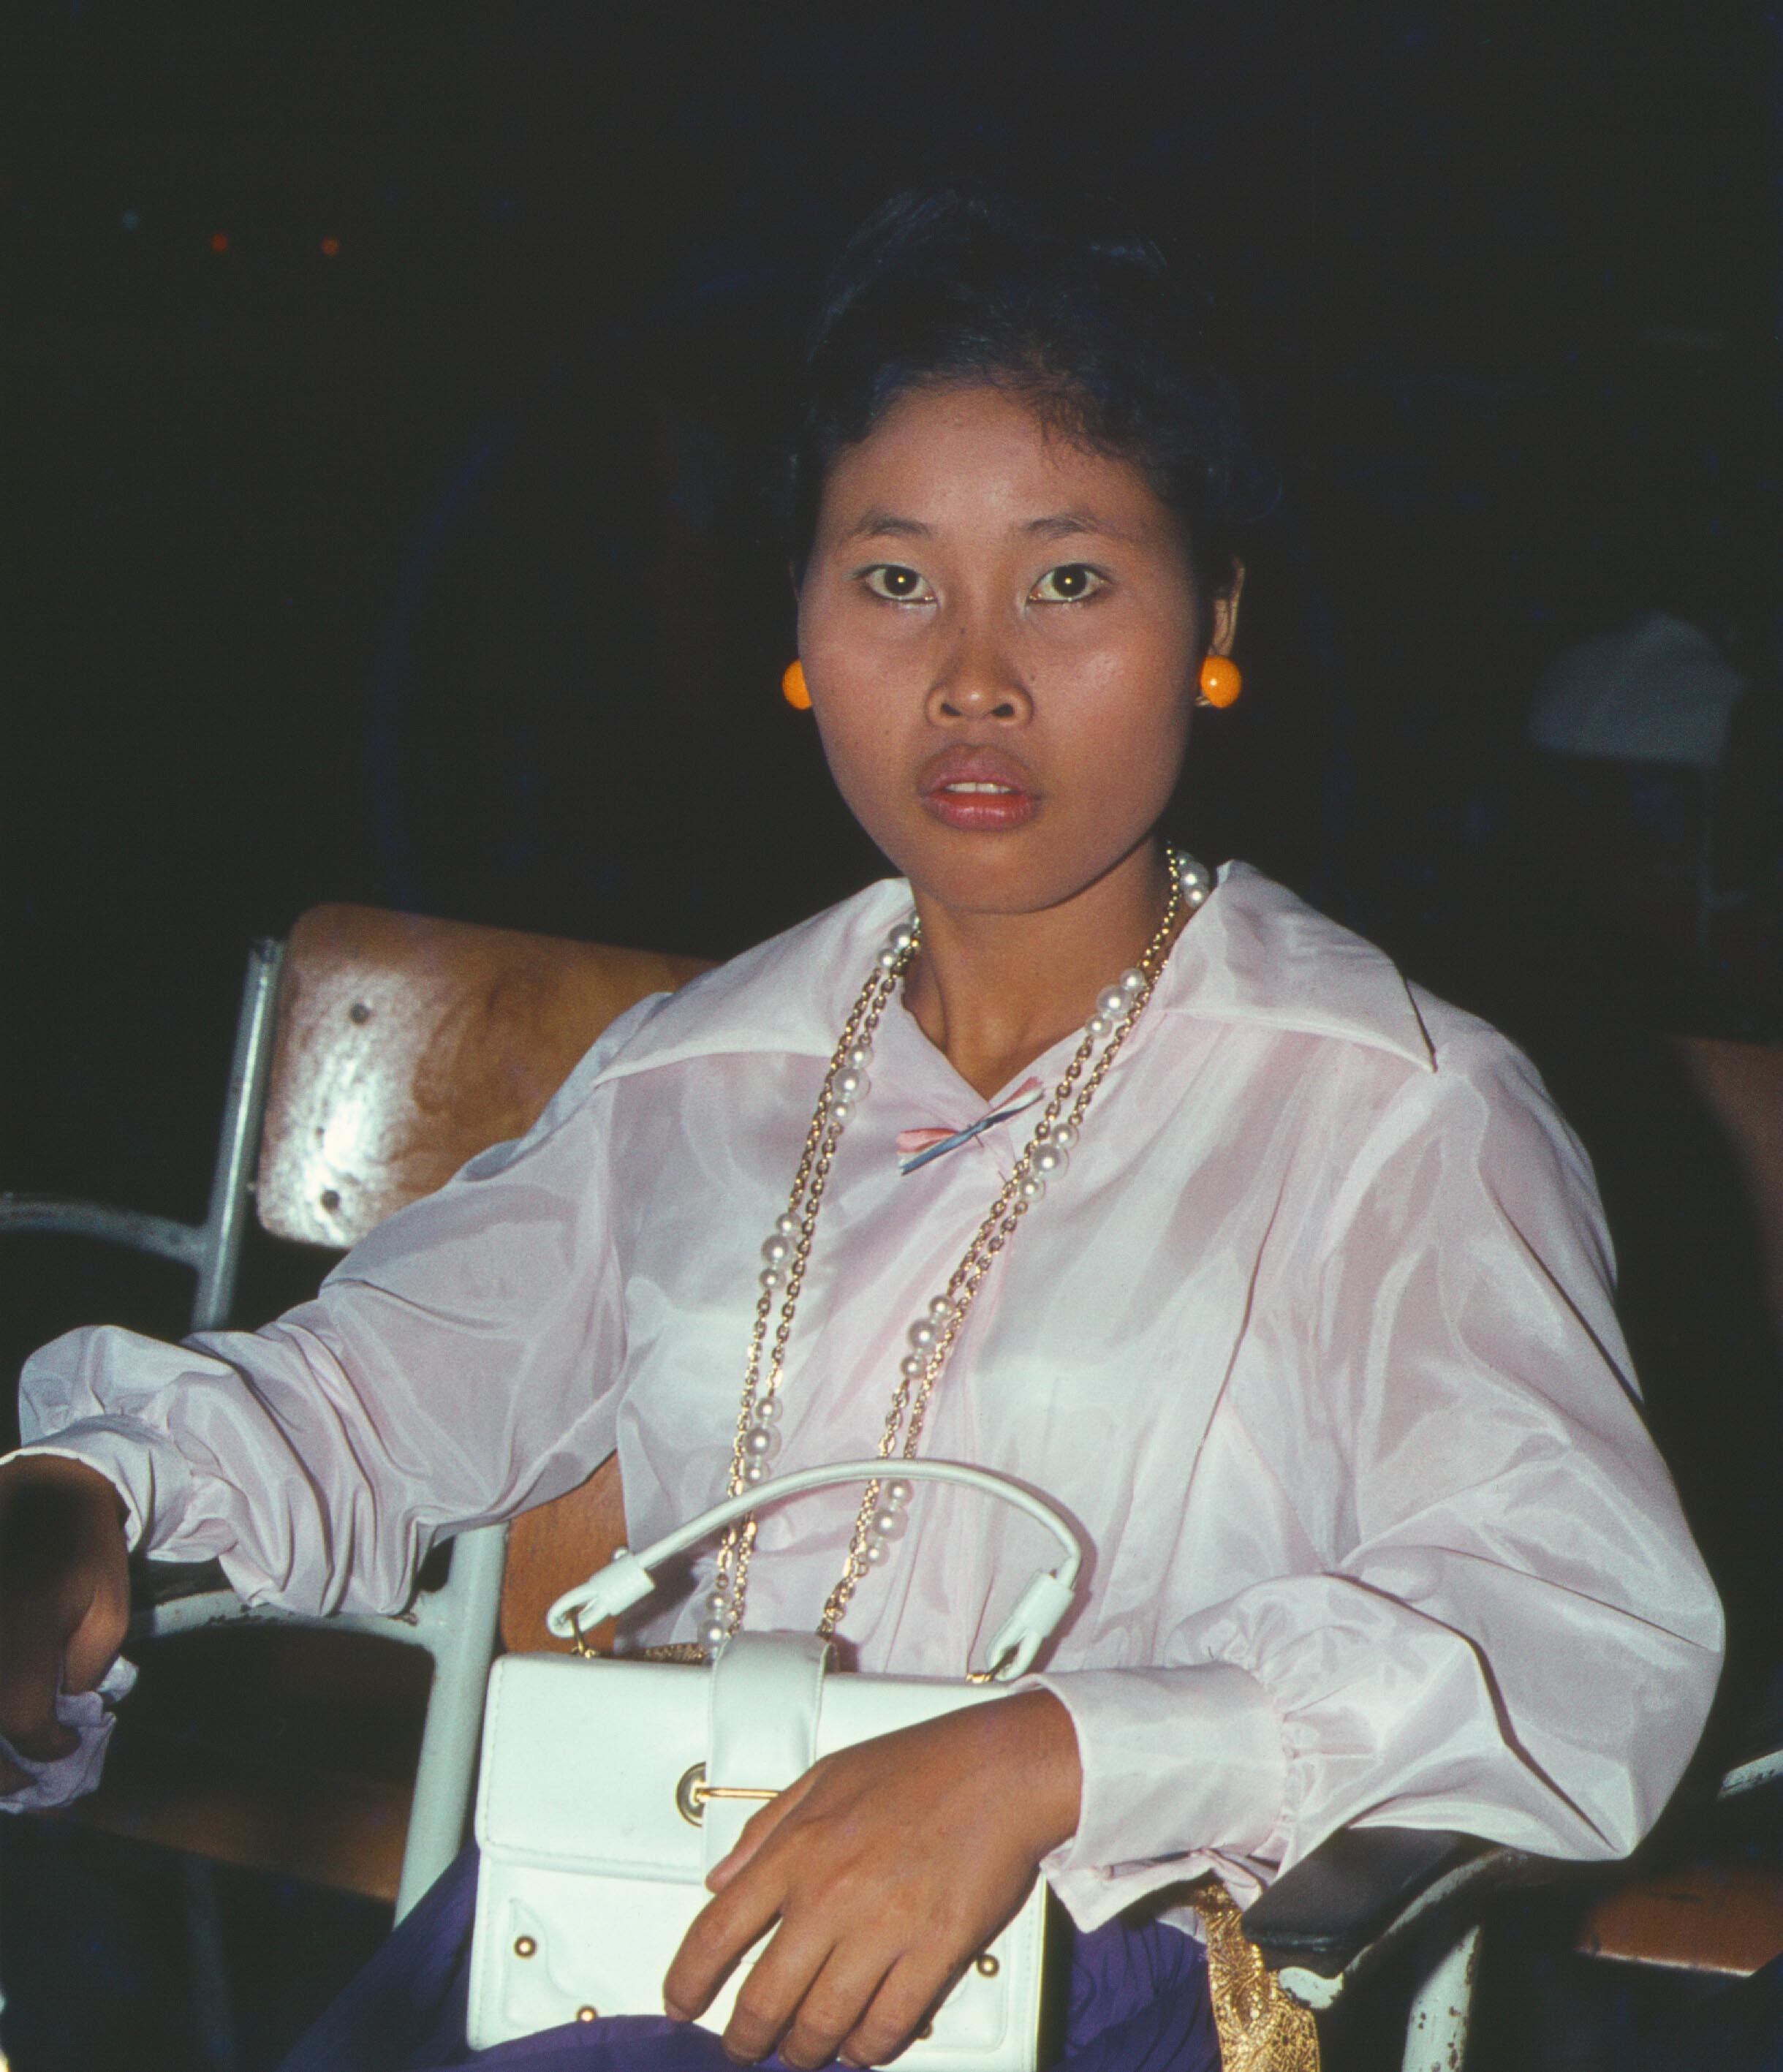 316. Suriname